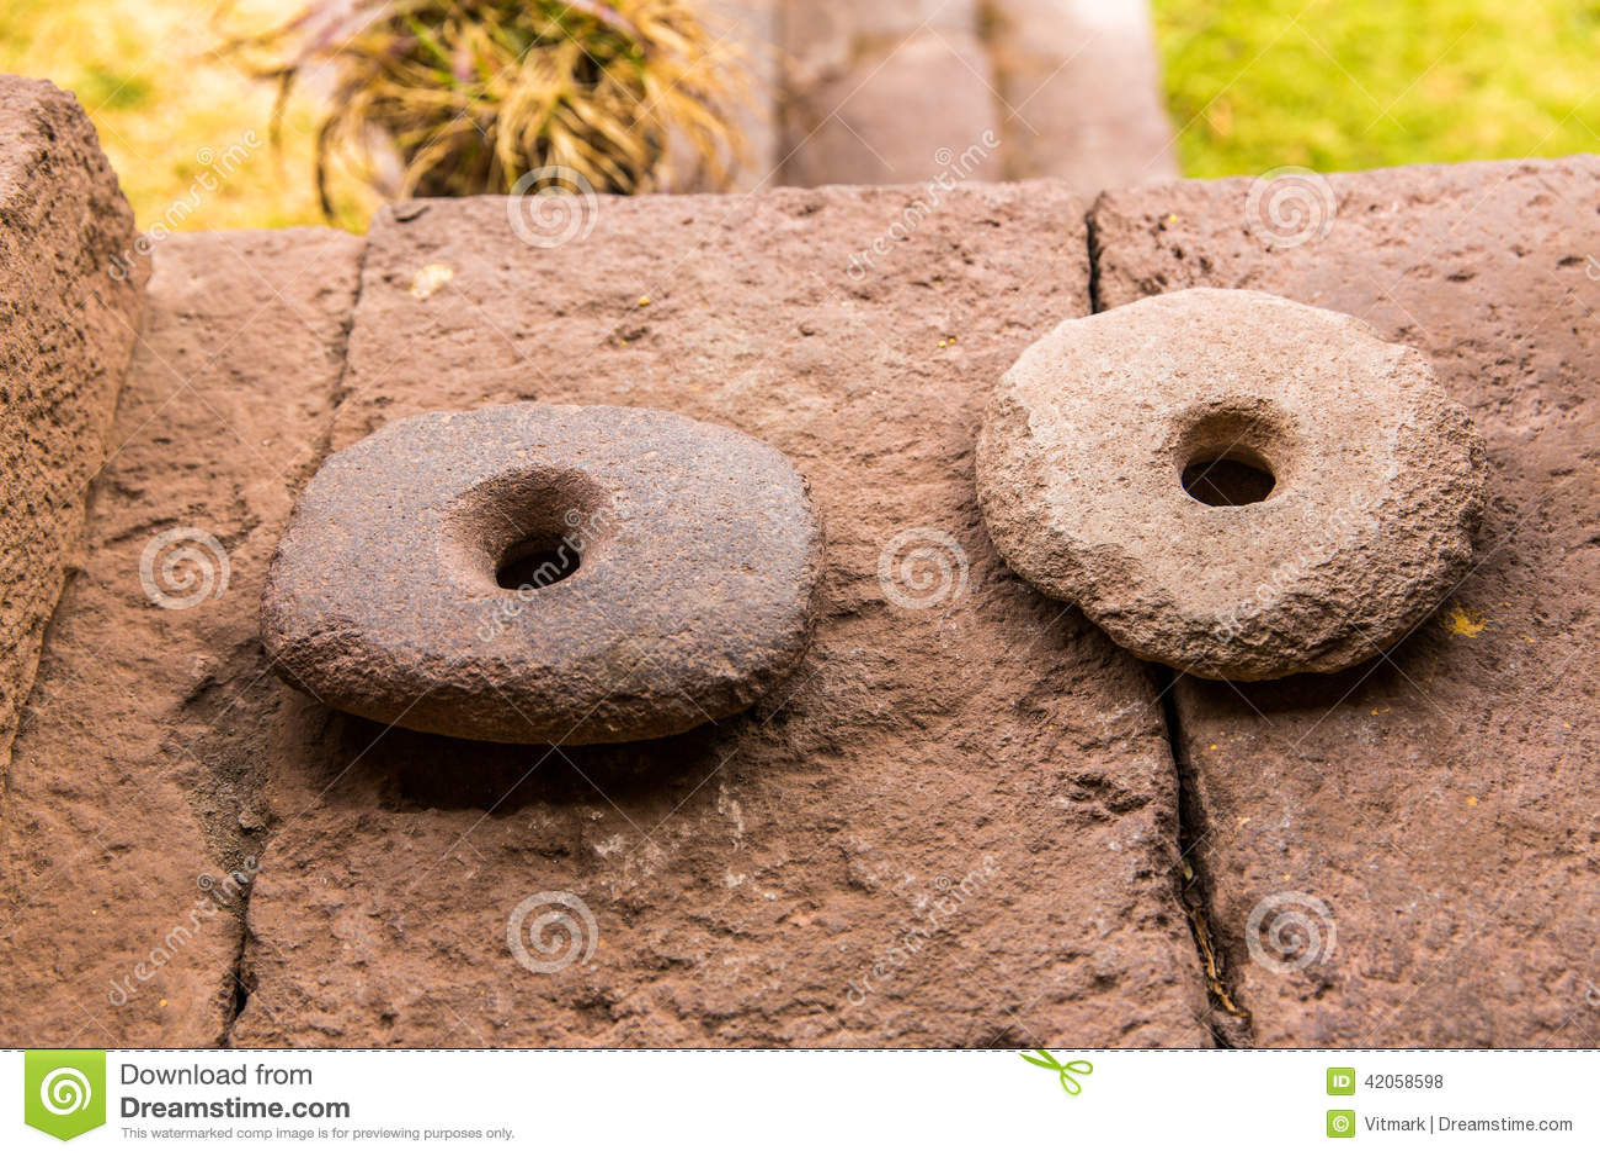 Peru ancient aztec and maya stone sculptures stock photo